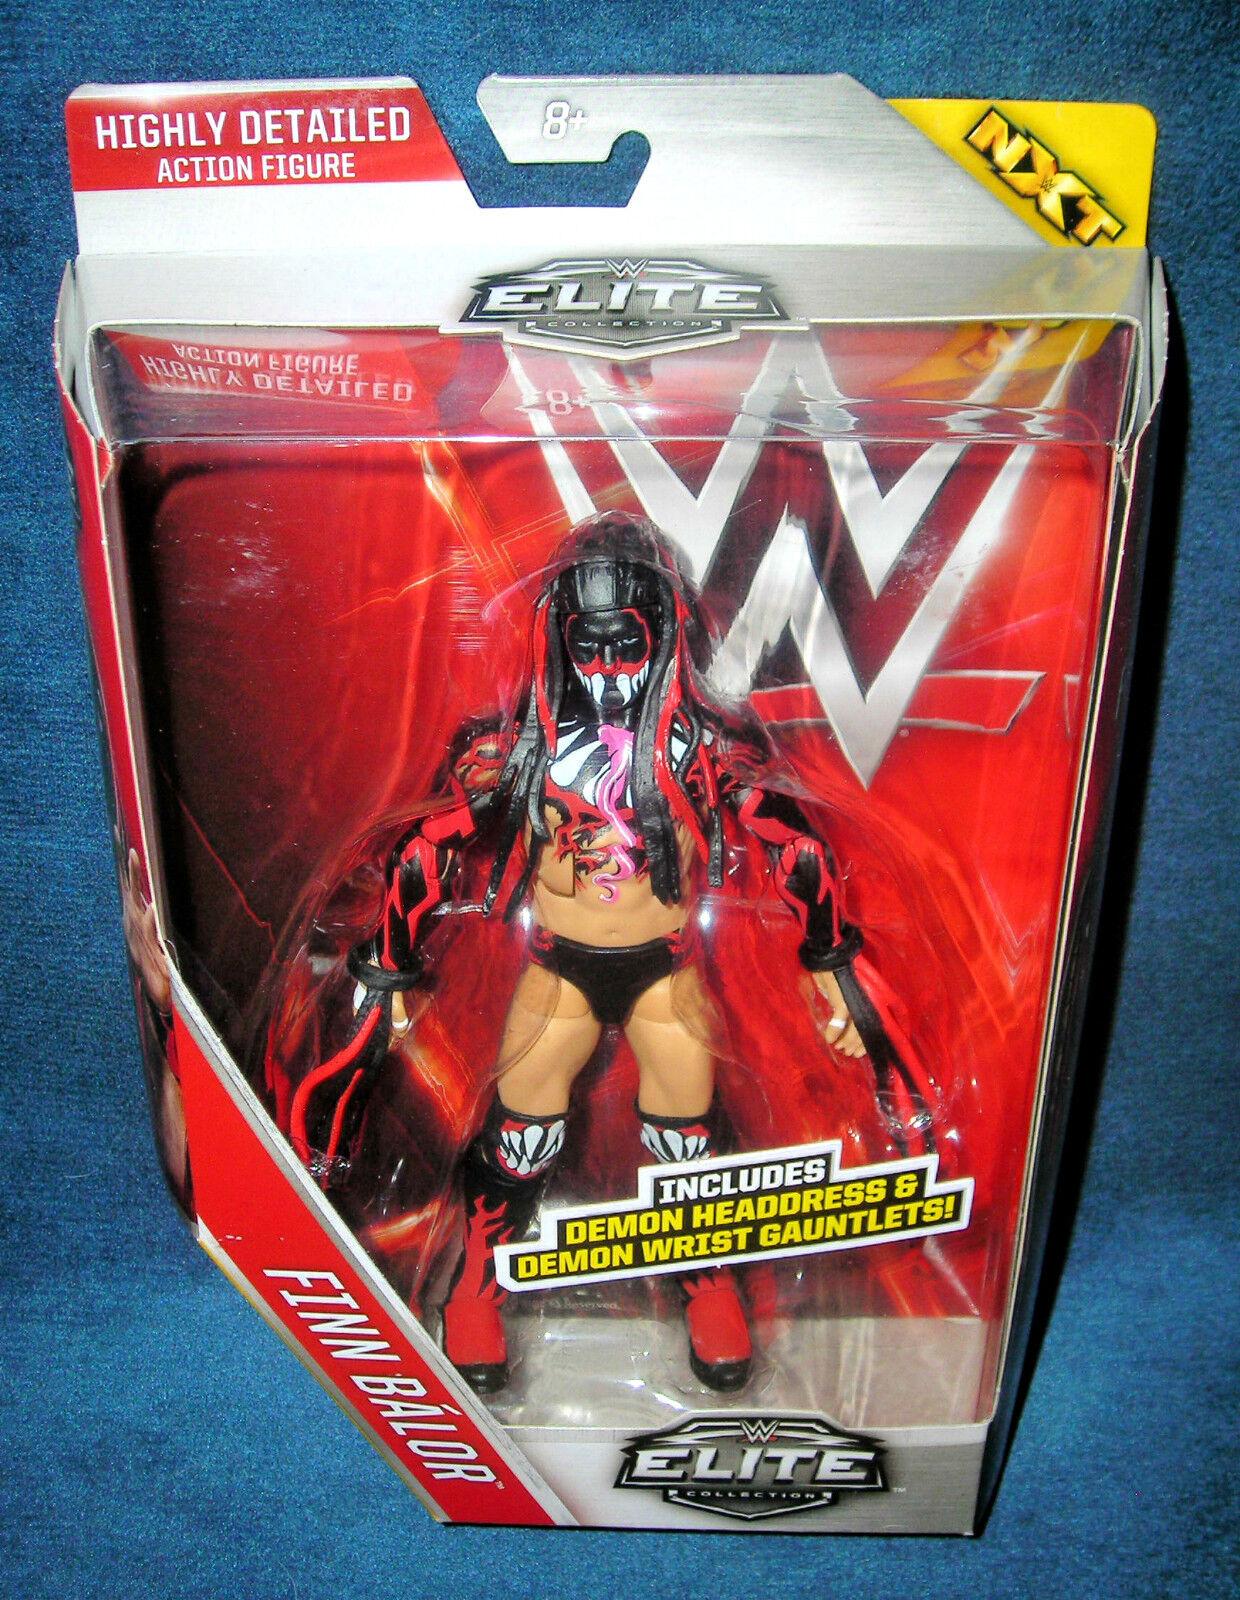 Finn Balor NXT WWE Elite súperEstrella ganó Raw demonio tocado Demonio Muñeca